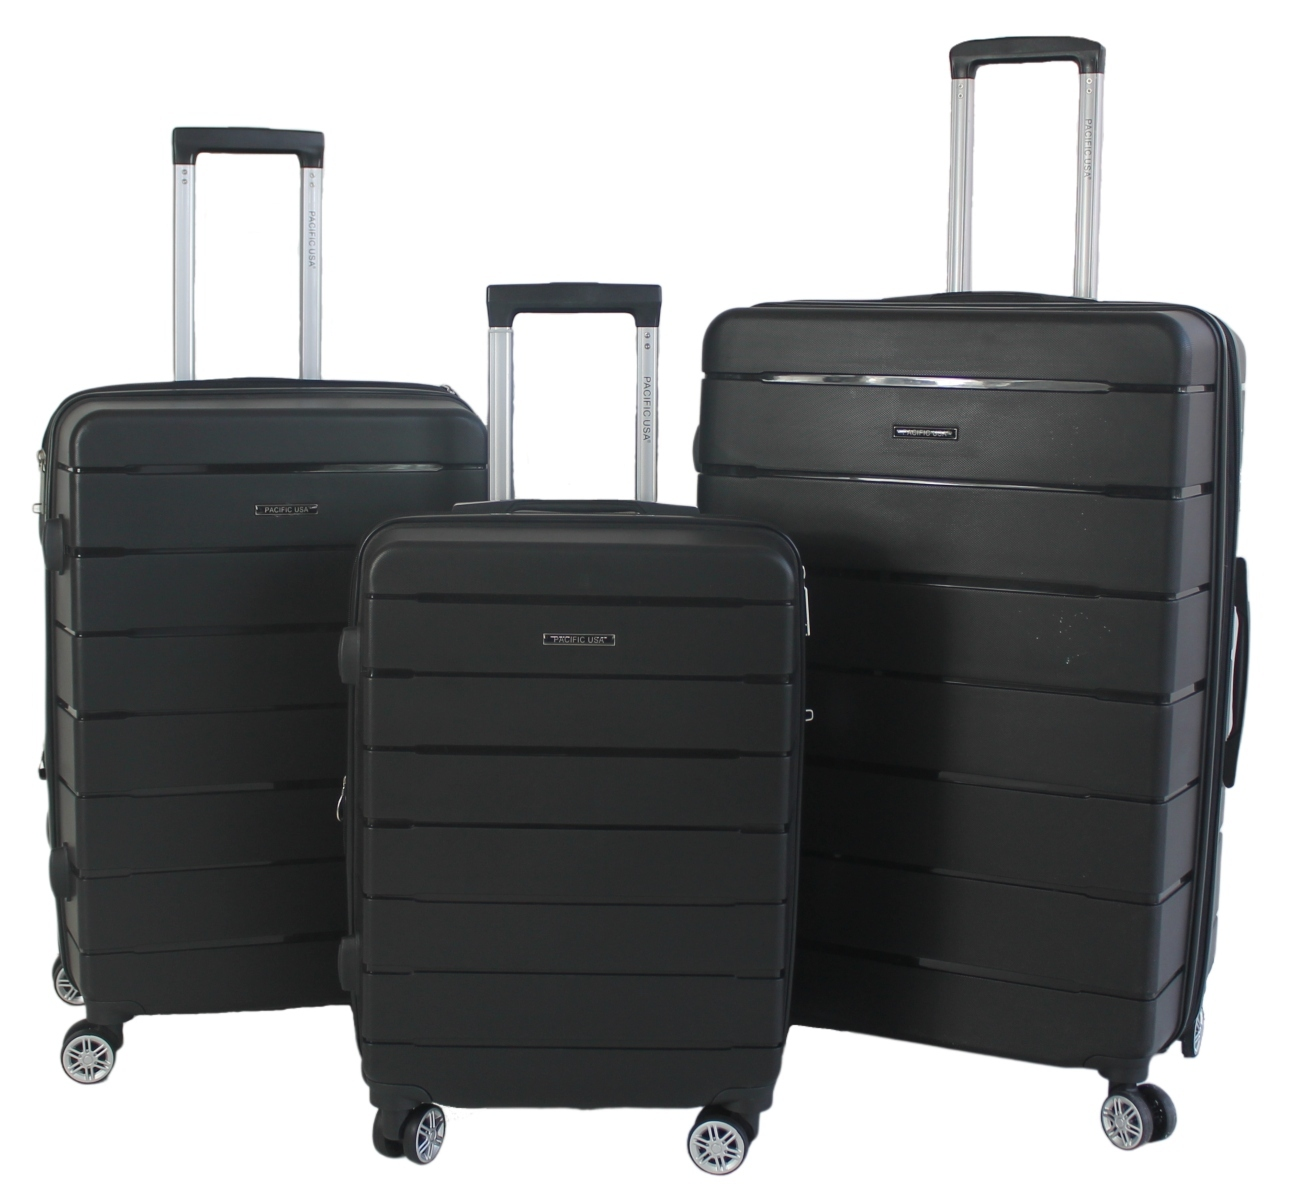 Kit com 3 Malas G, M, P Pacific USA California Polipropileno Ziper Antifurto, Cadeado TSA e Rodas Duplas